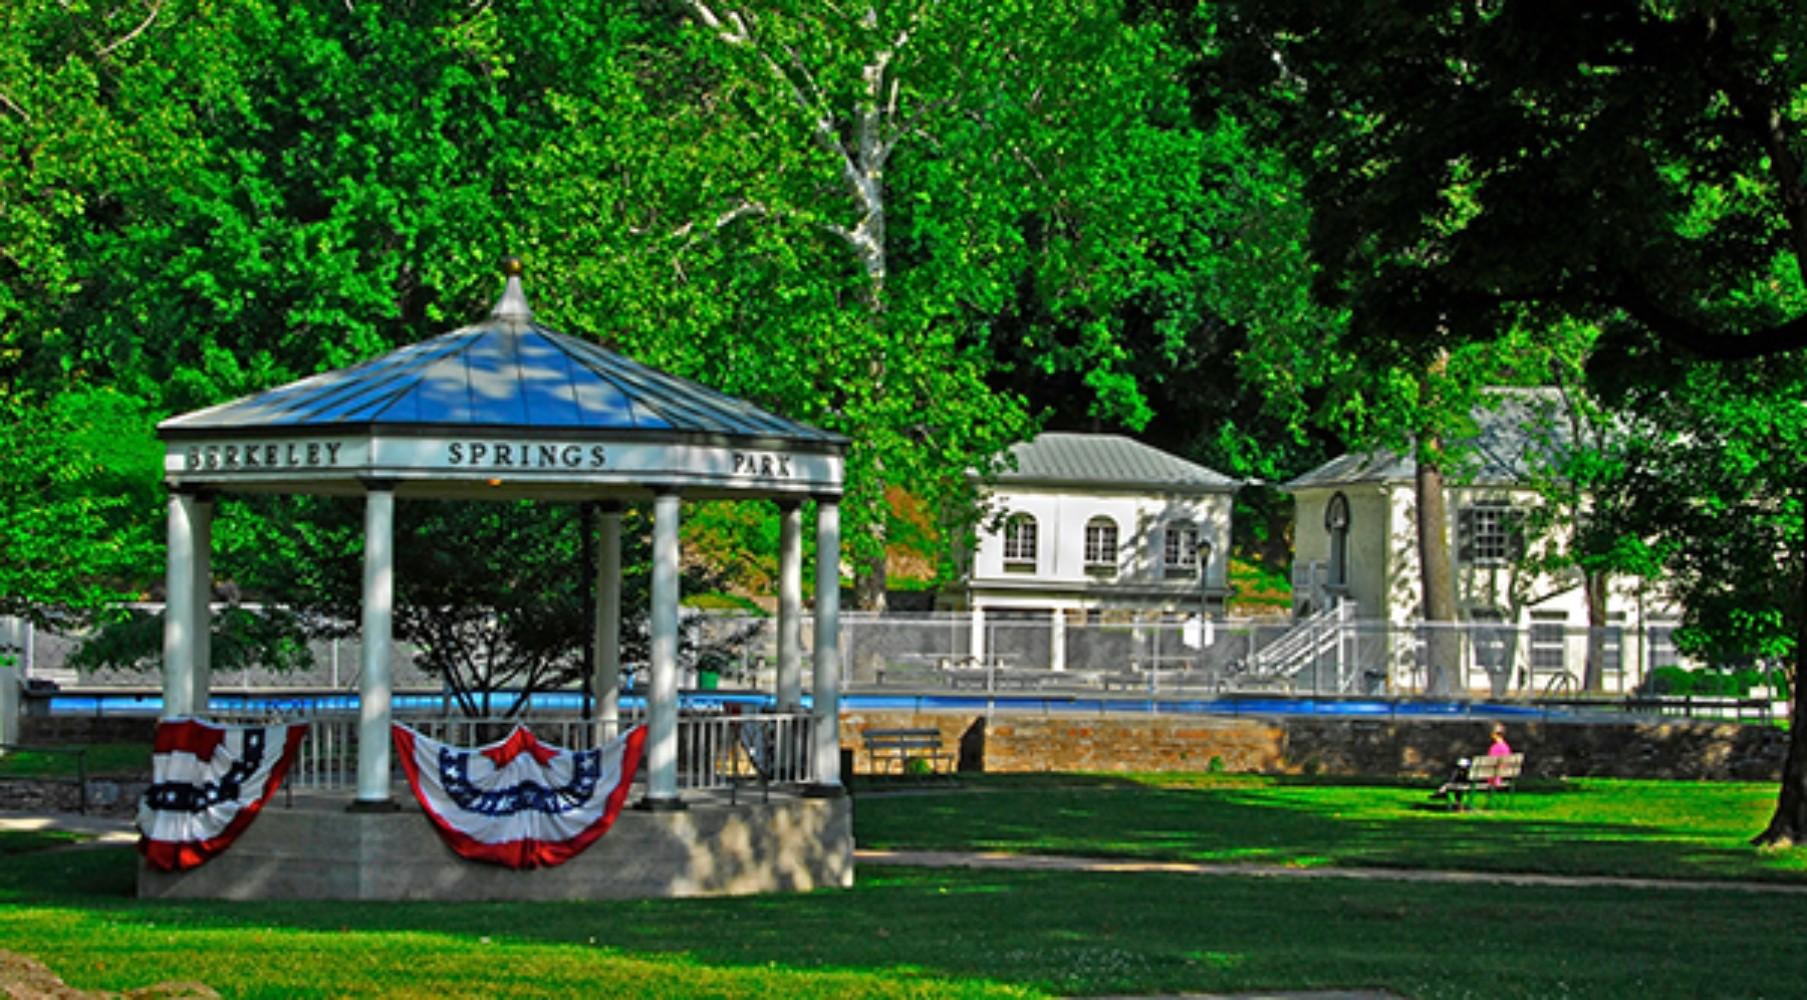 Berkeley Springs State Park